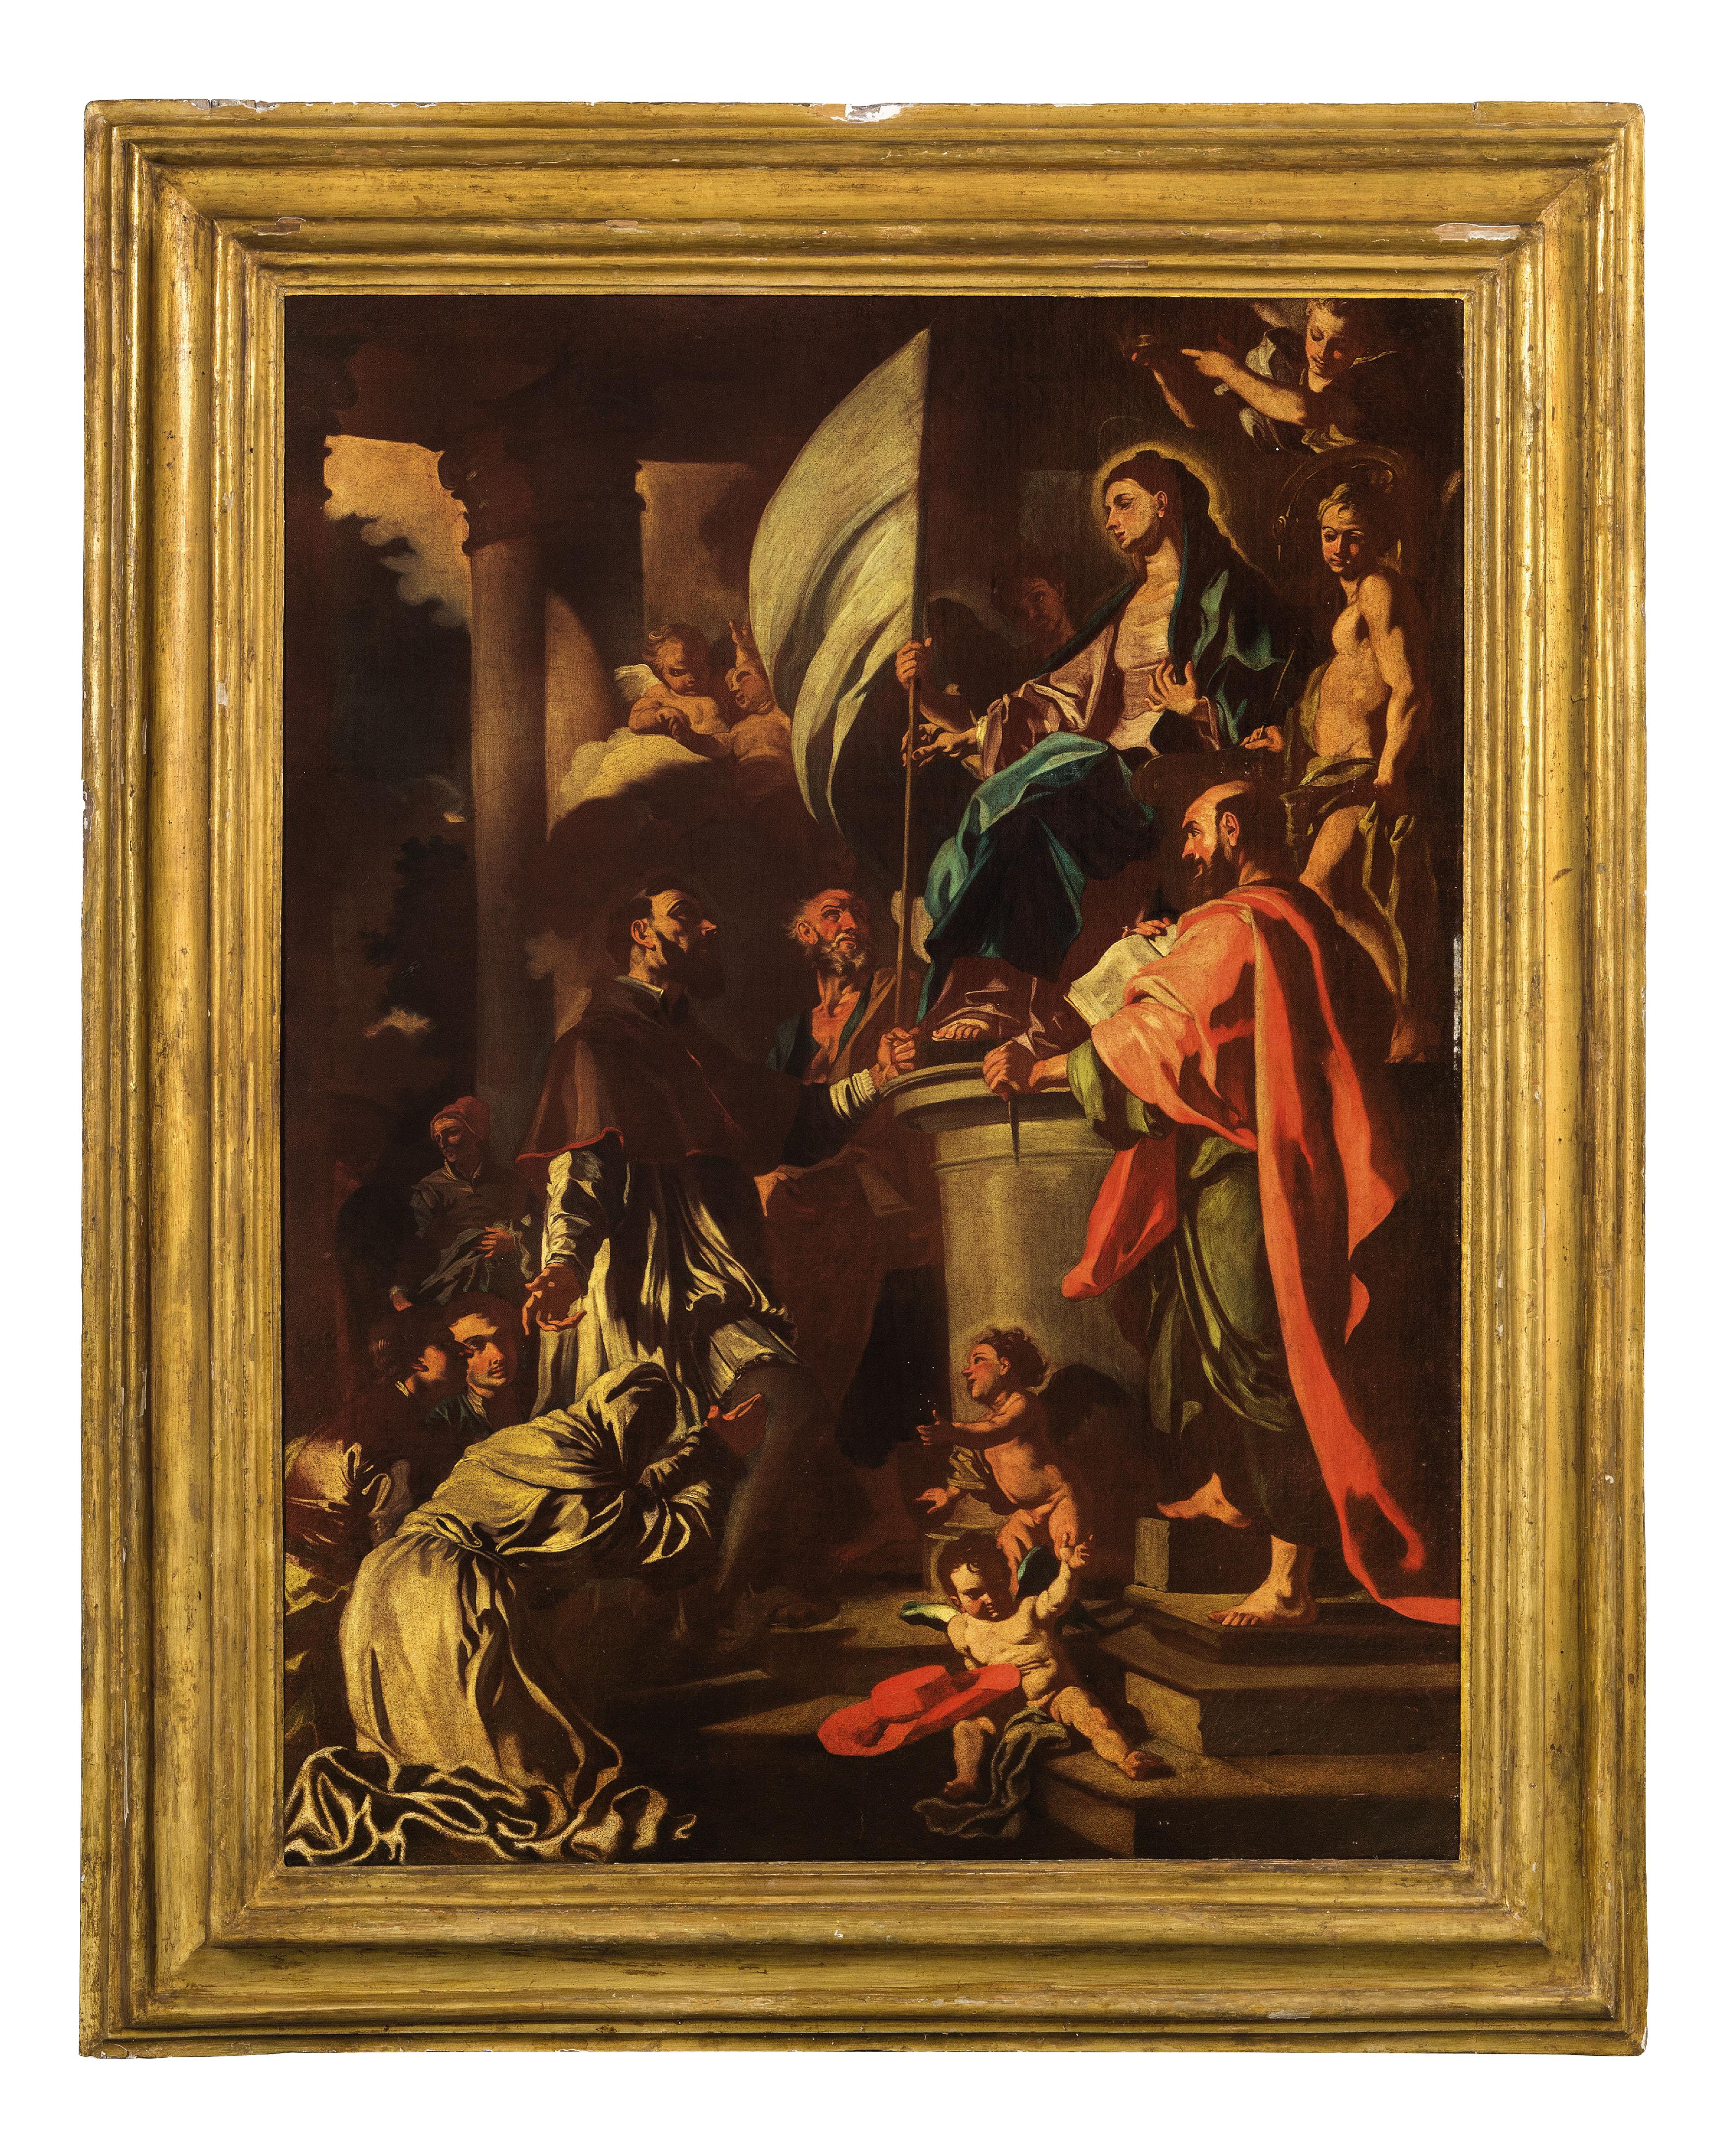 Francesco solimena bottega di wannenes art auctions casa d 39 aste a genova milano roma - Gonfalone mobili roma ...